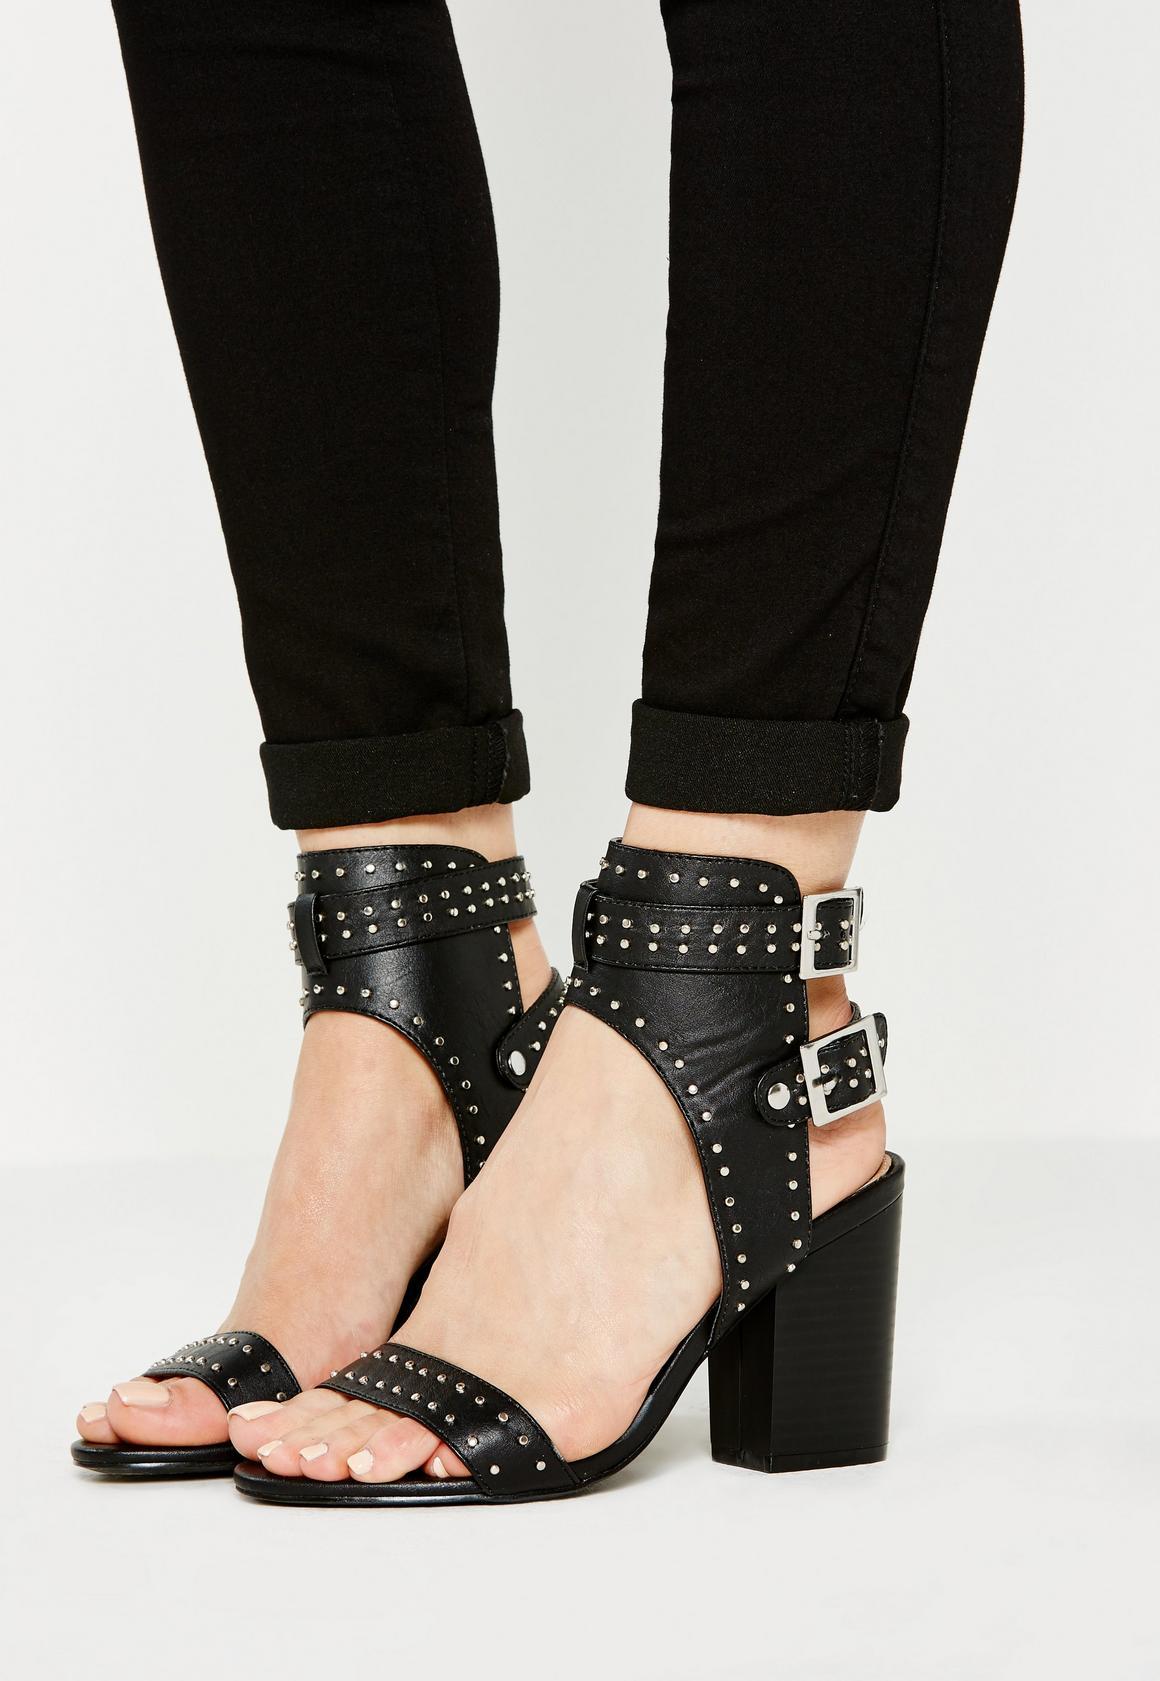 Black sandals ireland - Black Studded Buckle Back Heeled Sandals Black Studded Buckle Back Heeled Sandals